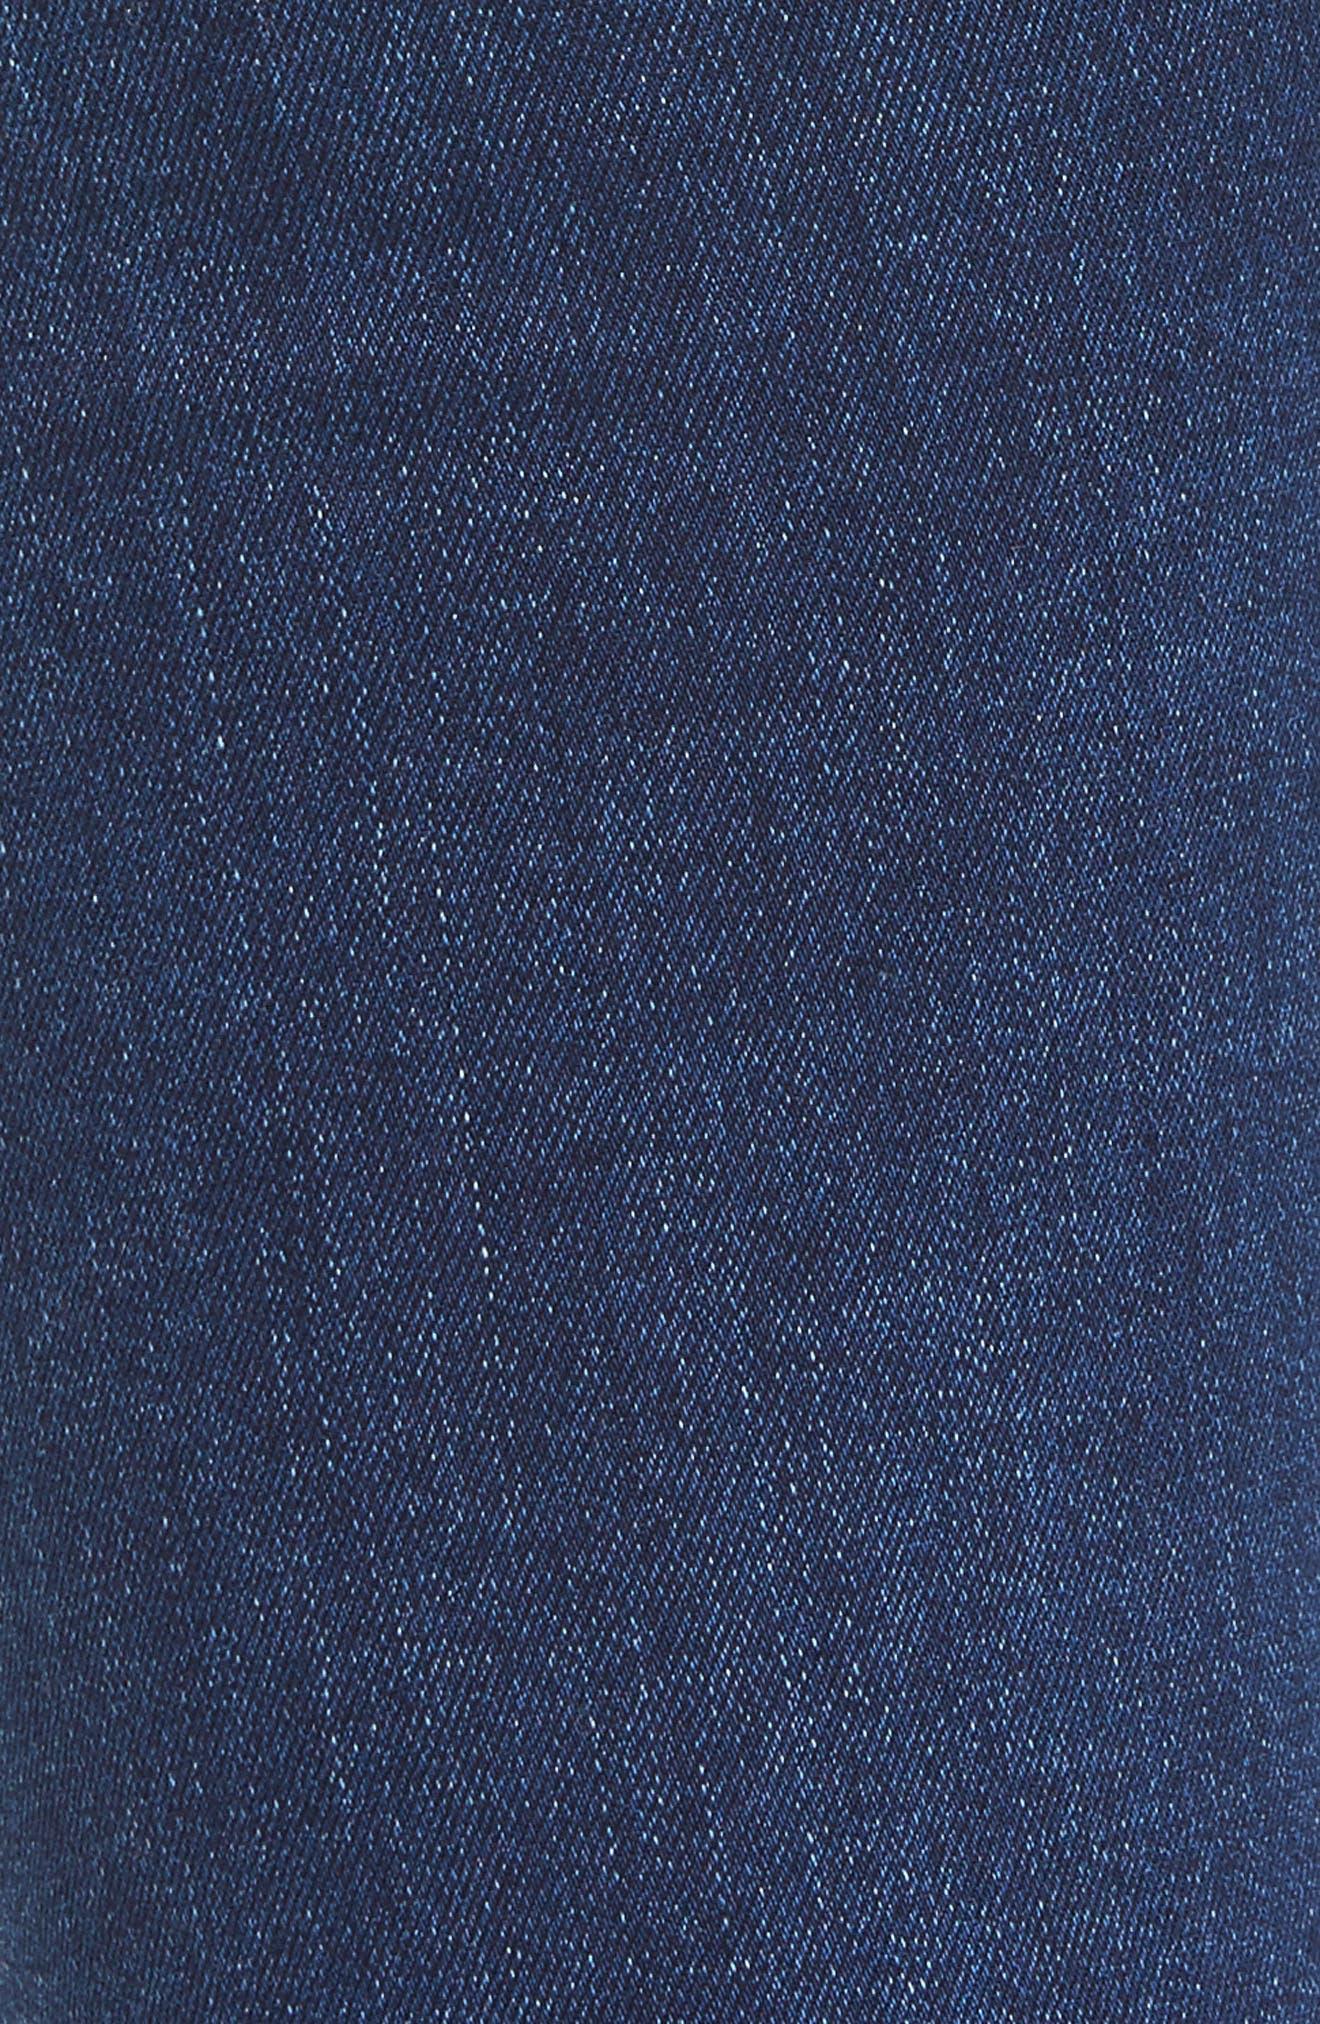 Alternate Image 5  - Hudson Jeans Colette Step Hem Skinny Jeans (Backbone)